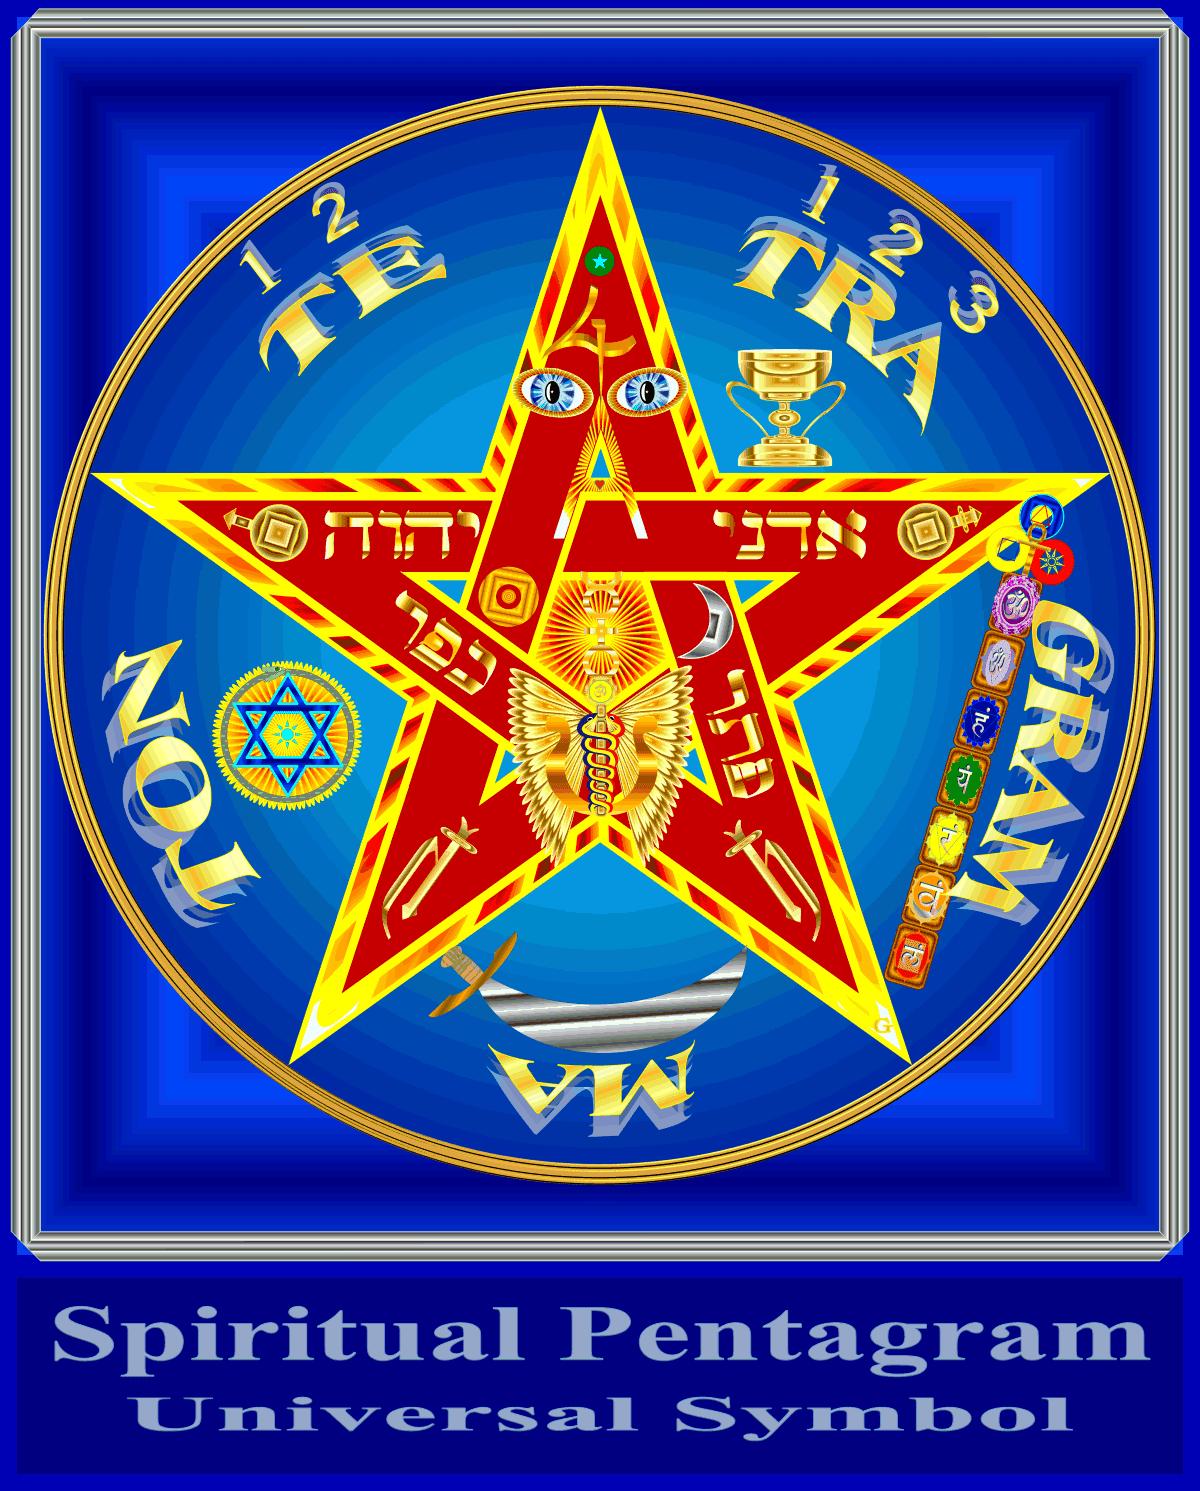 gnostic-spiritual-pentagram-